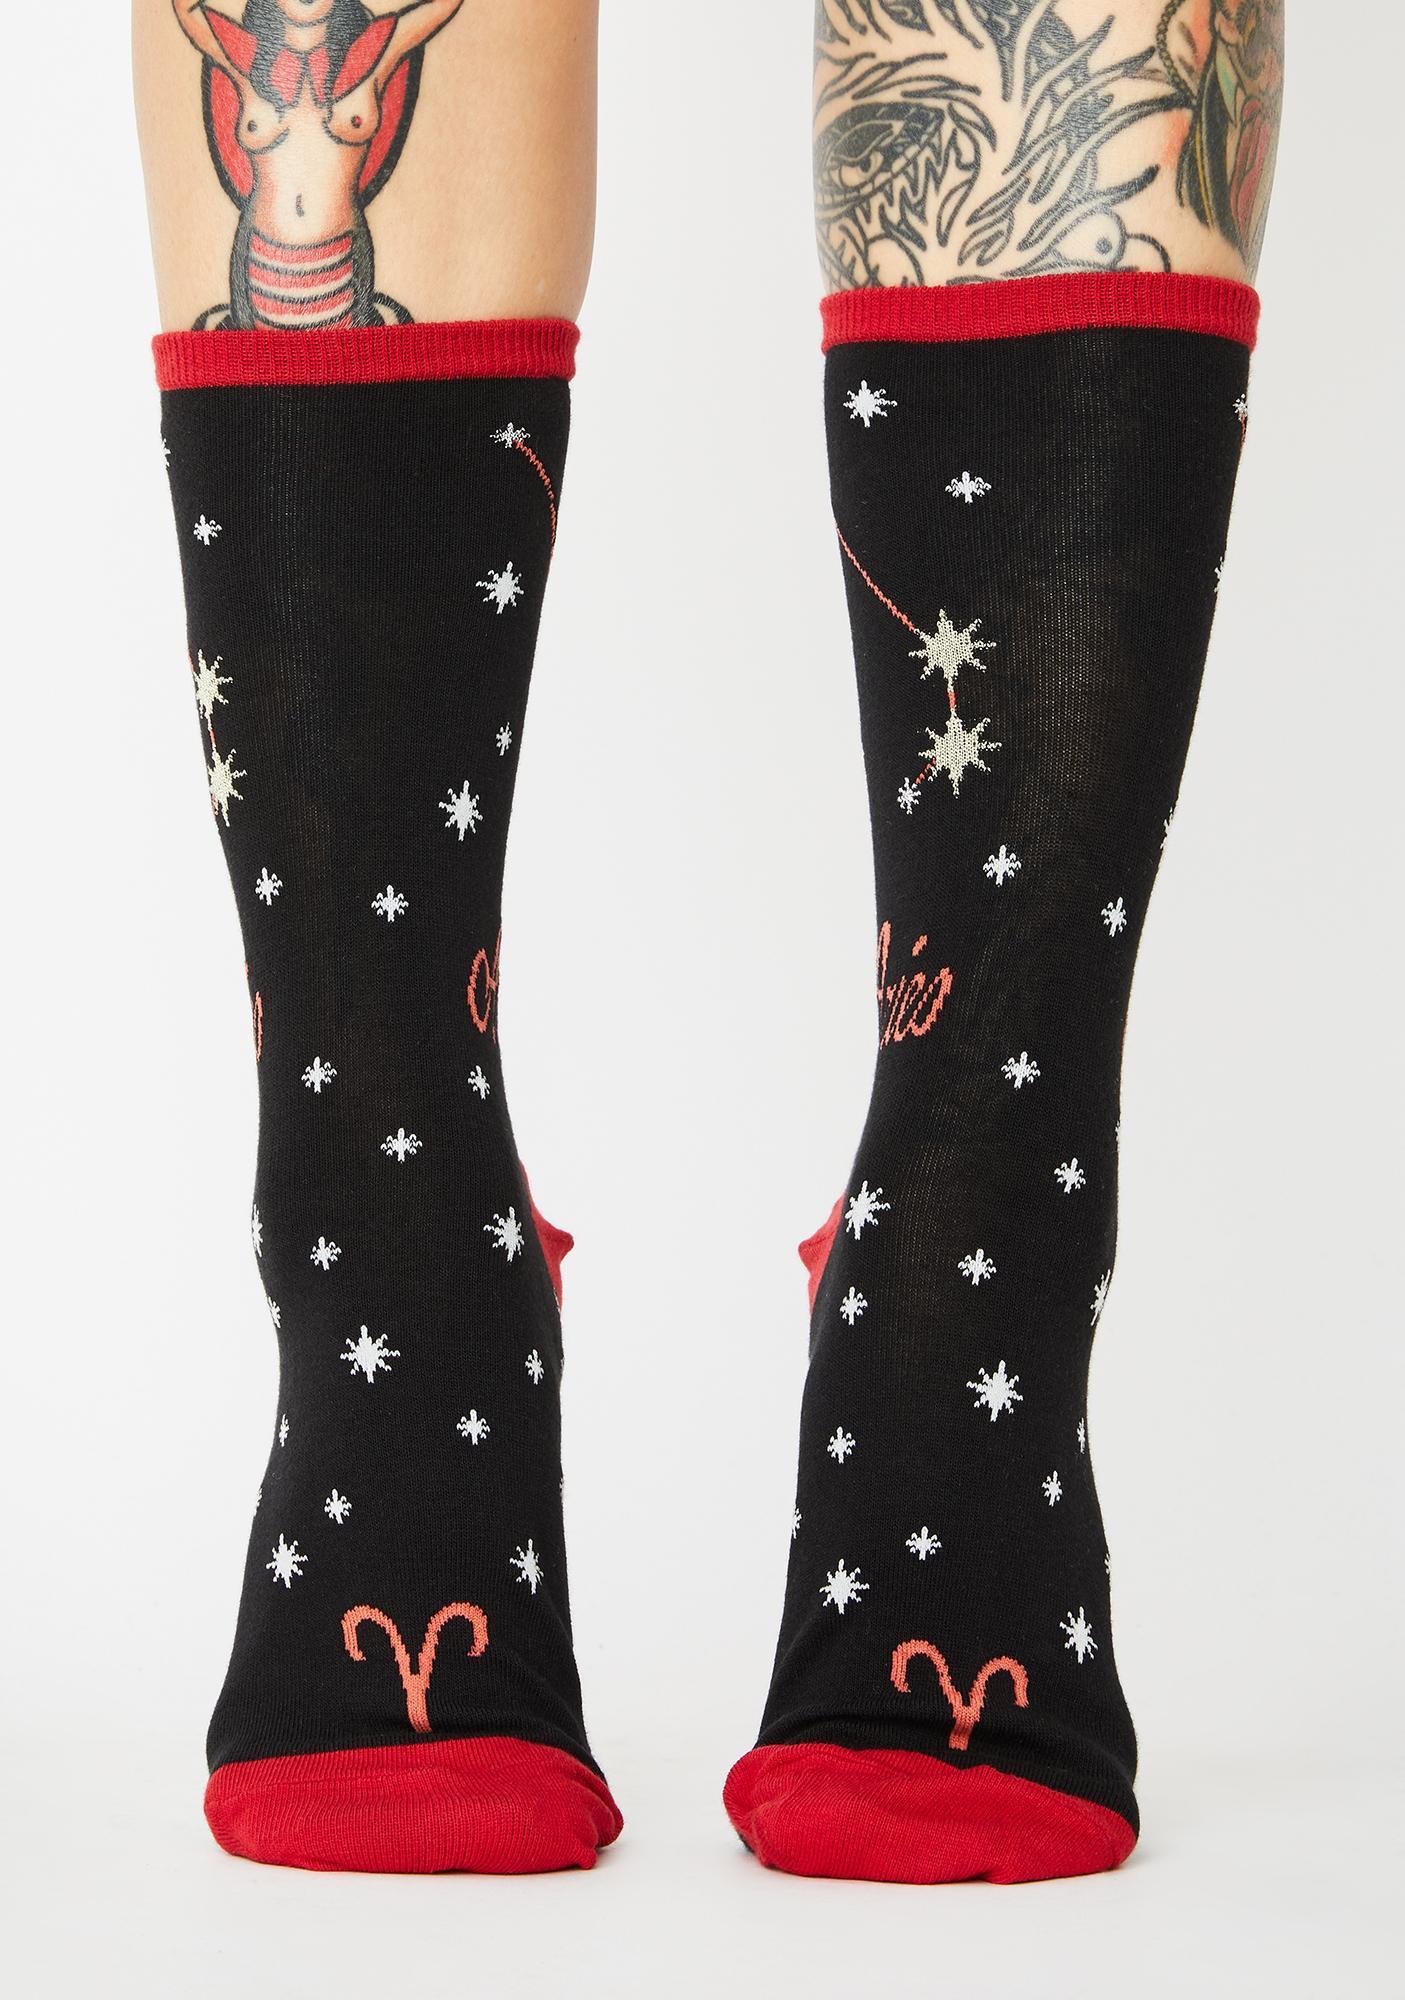 Socksmith Design Aries Crew Socks